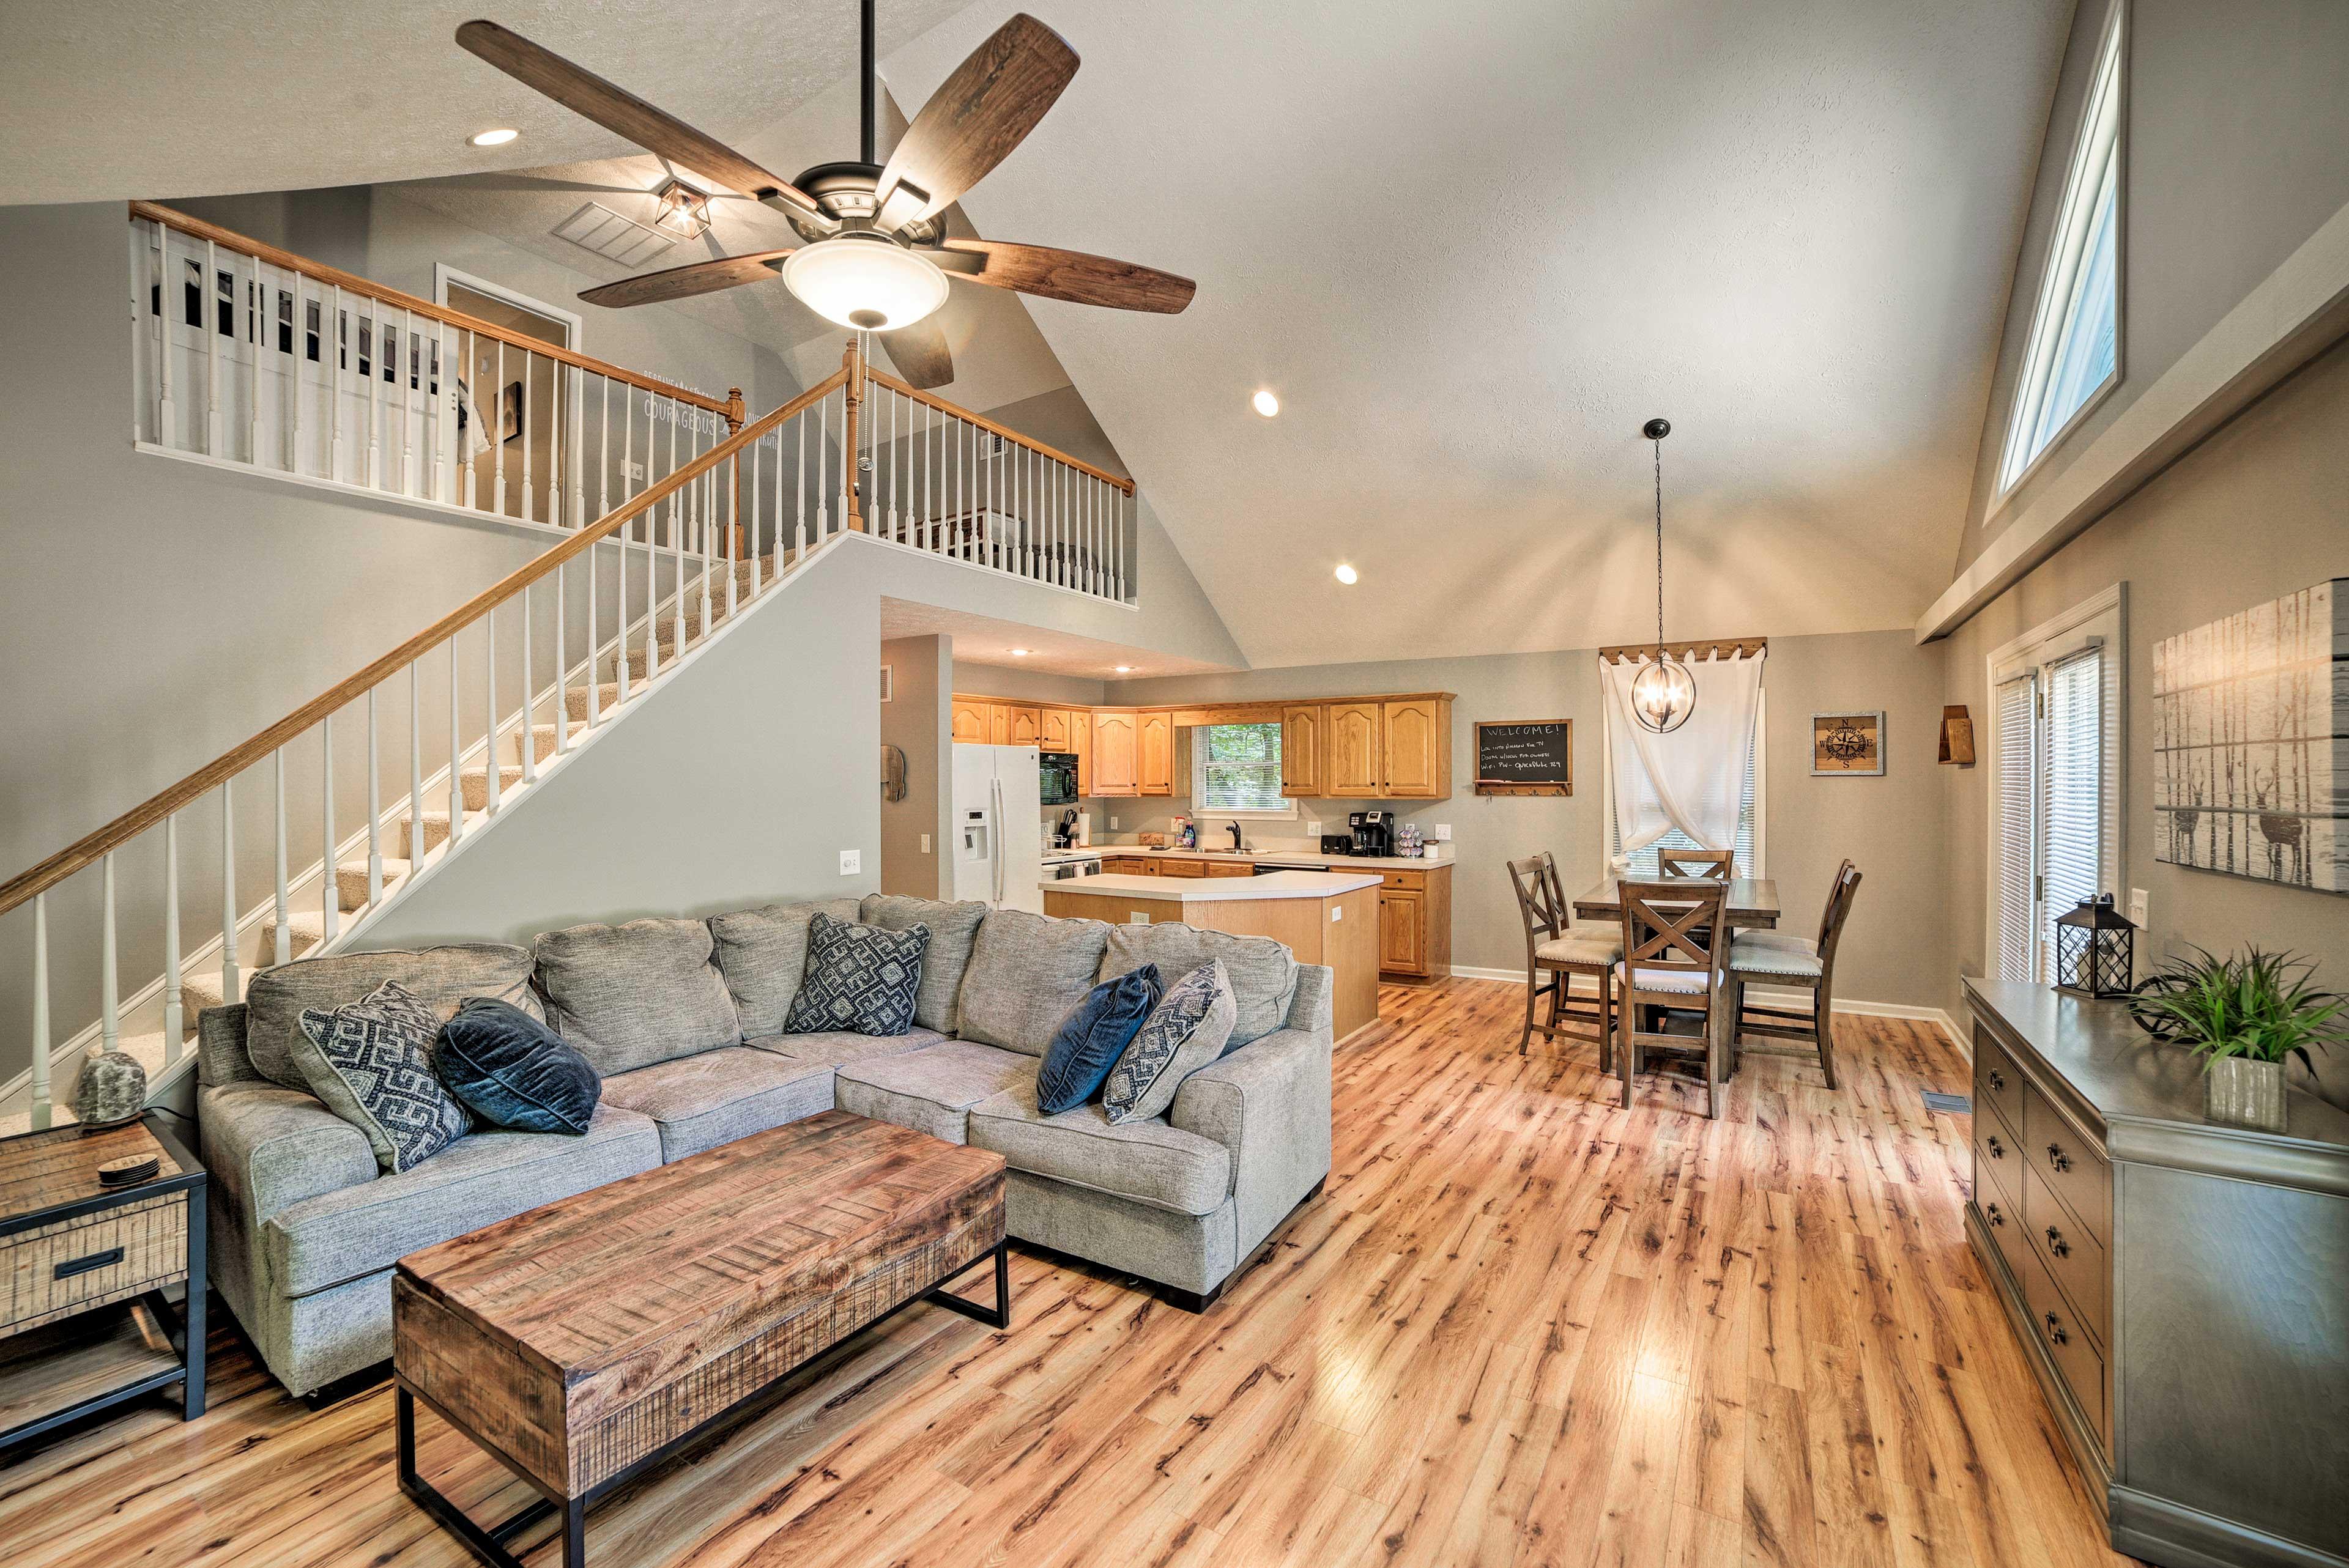 Sleek hardwood floors span the open living area.